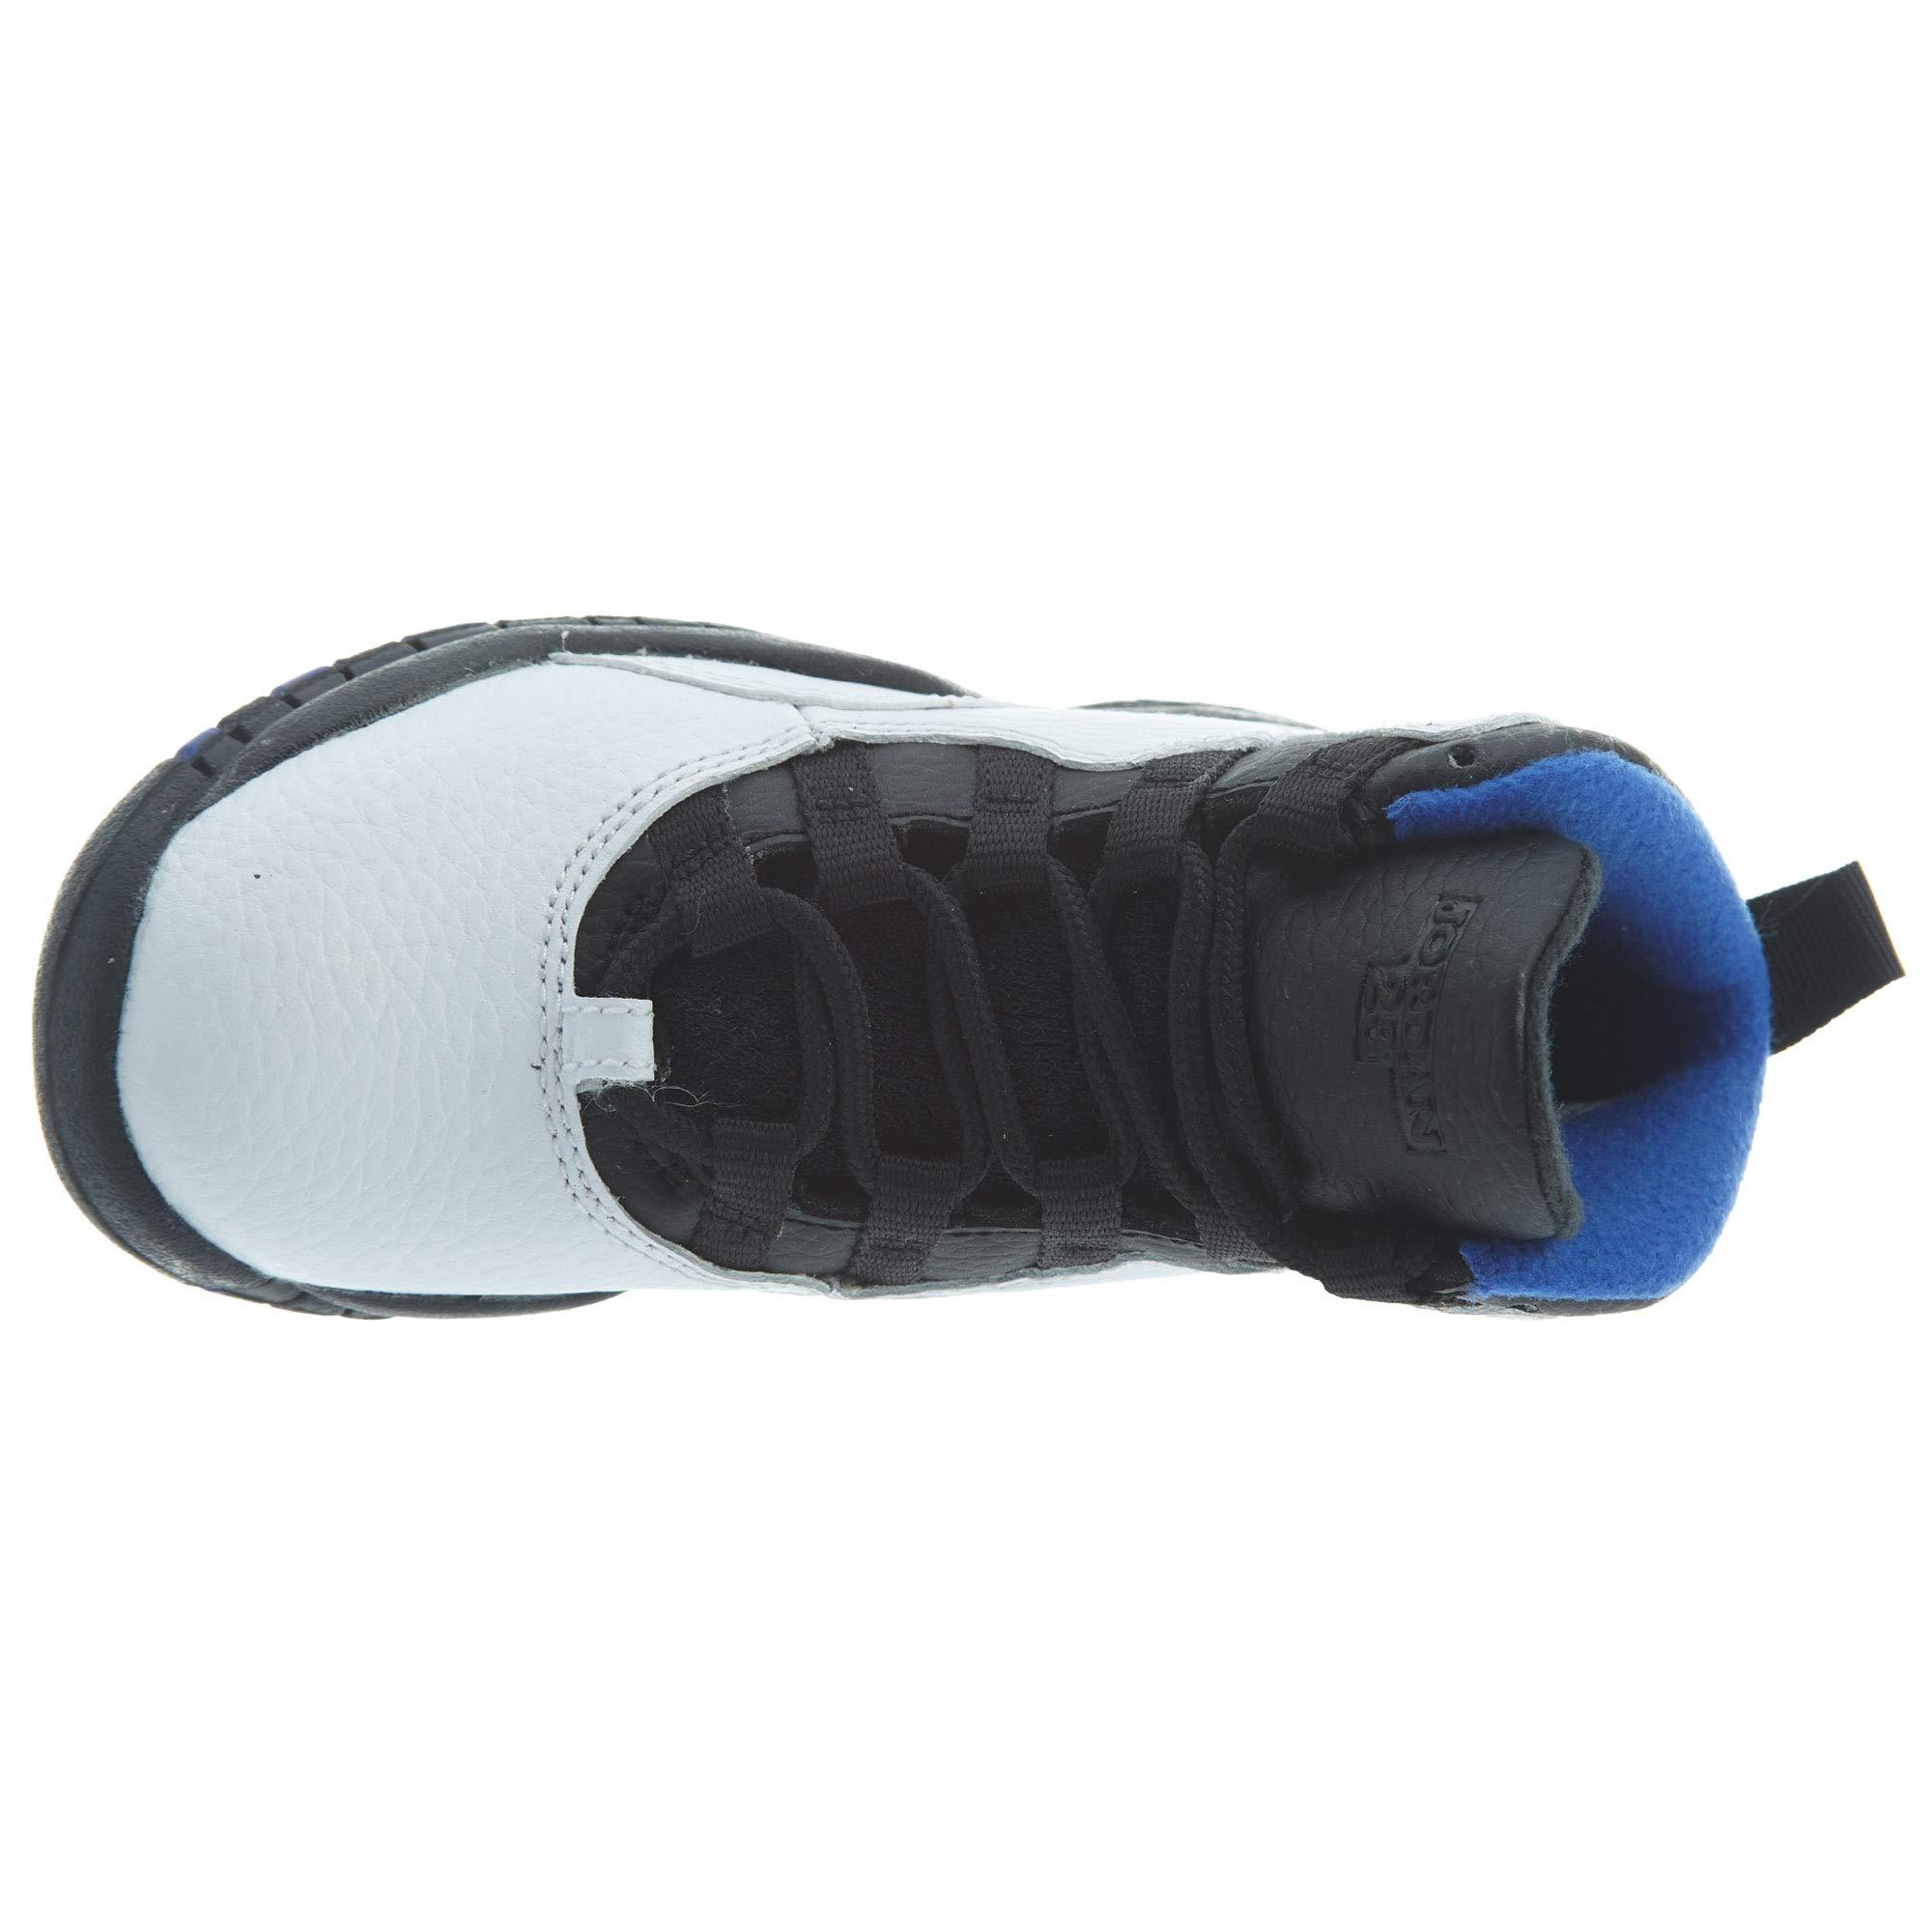 Jordan Air Retro 10''Orlando White/Black-Royal Blue (PS) (13 M US Little Kid) by Jordan (Image #6)